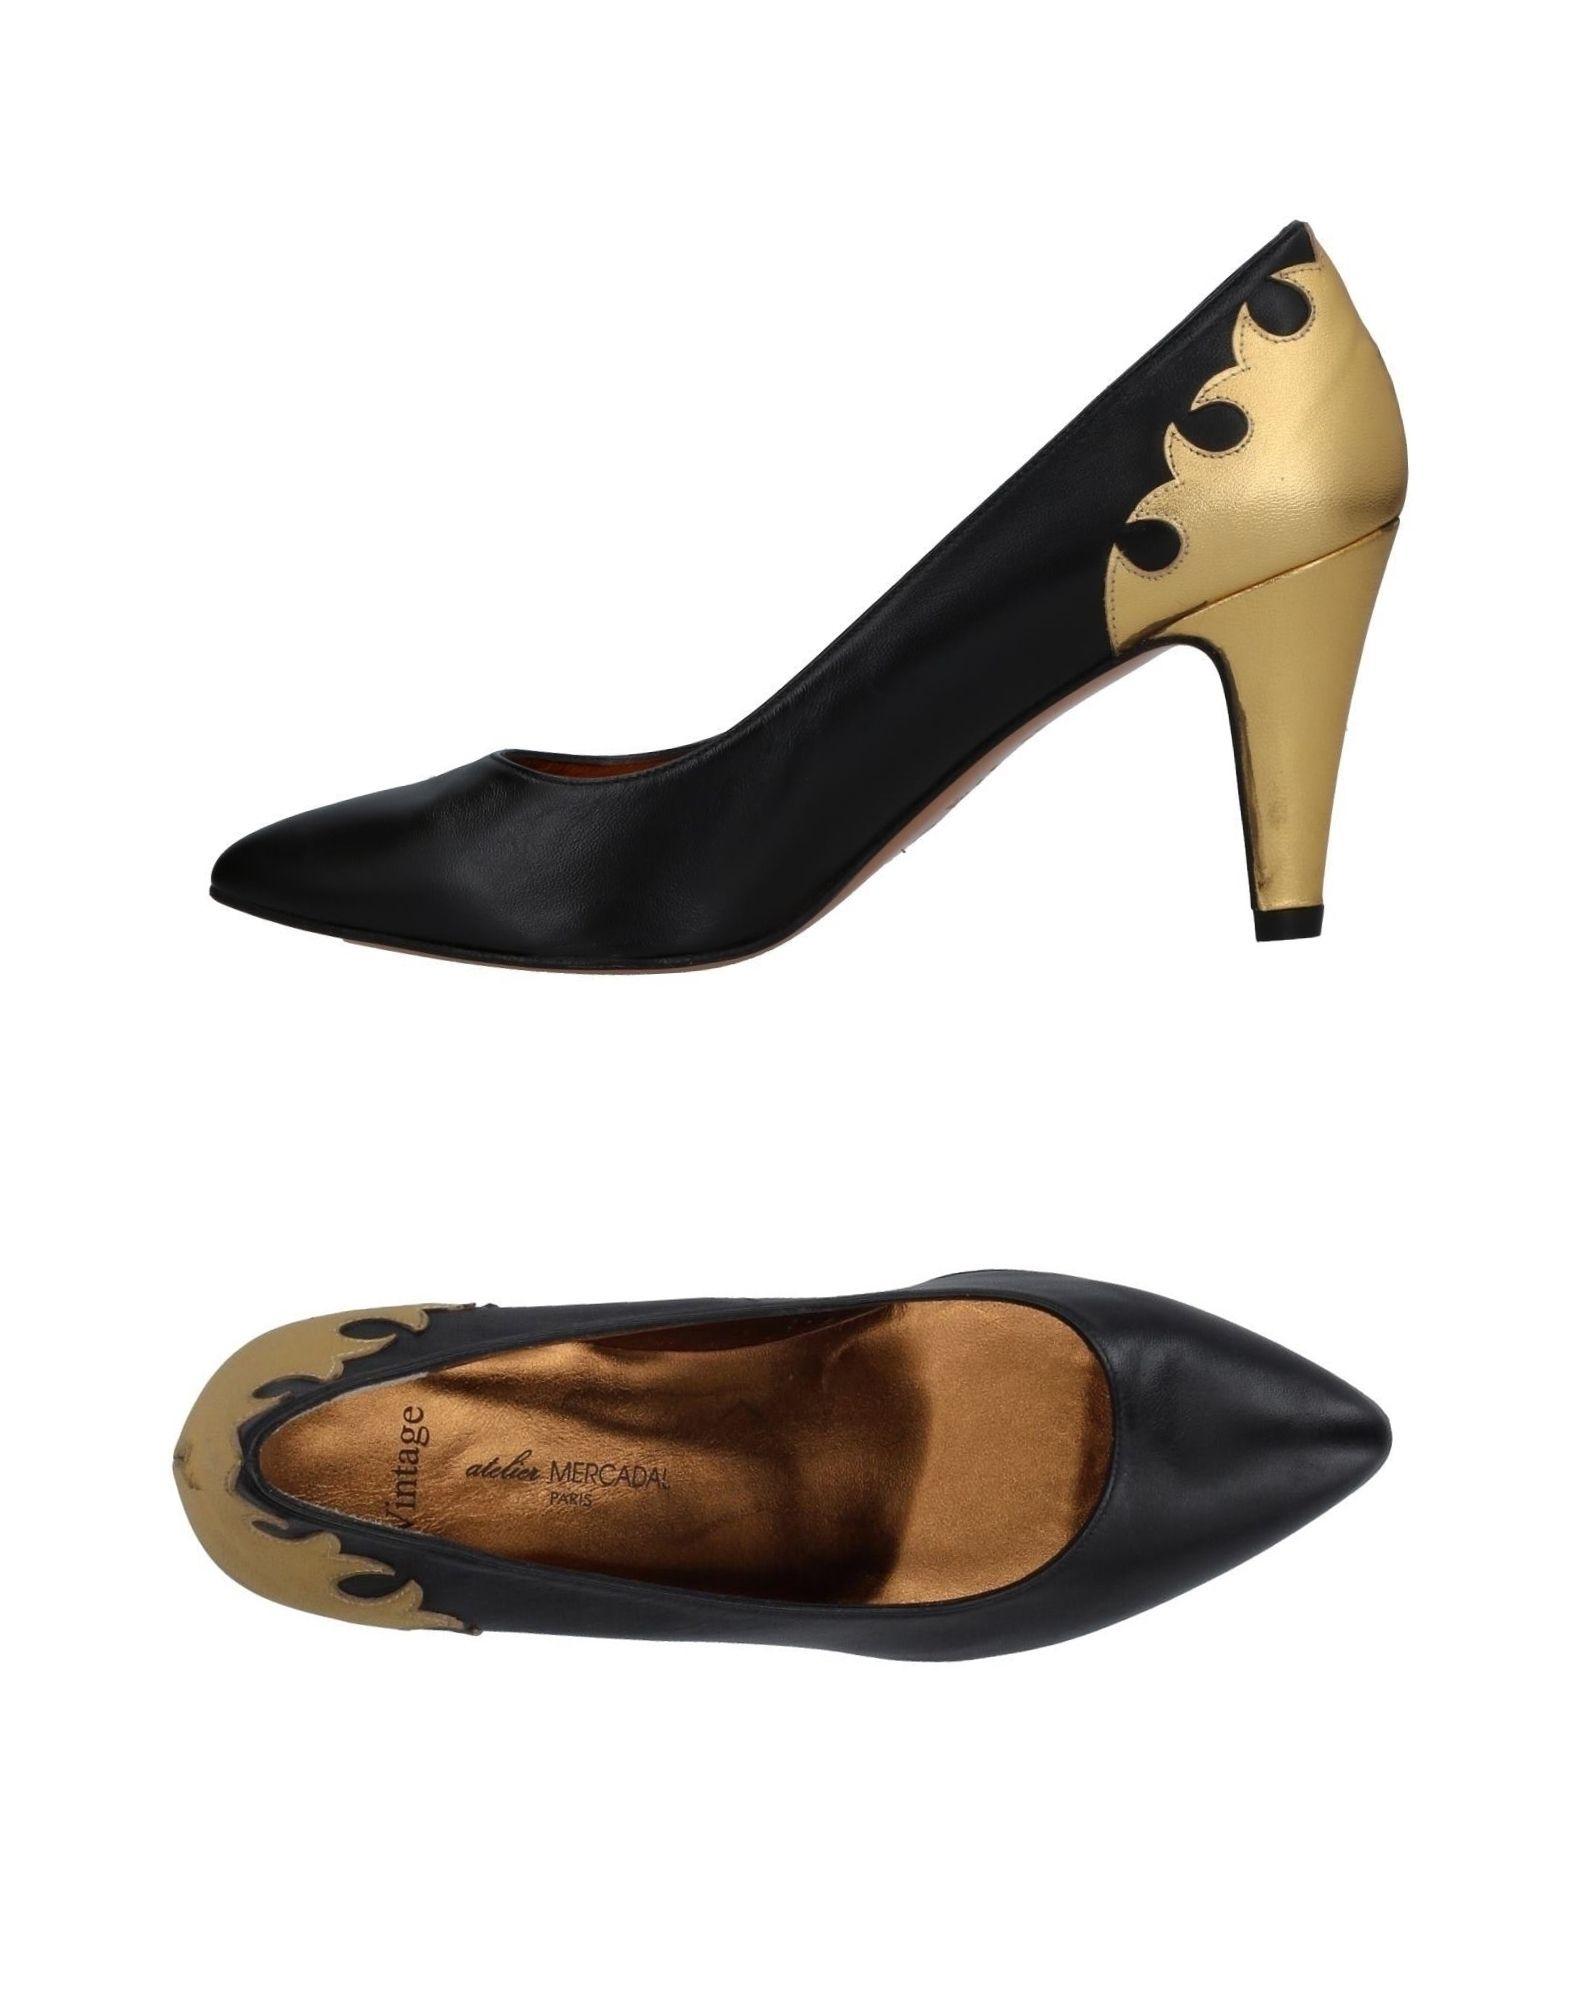 ATELIER MERCADAL VINTAGE Туфли цены онлайн